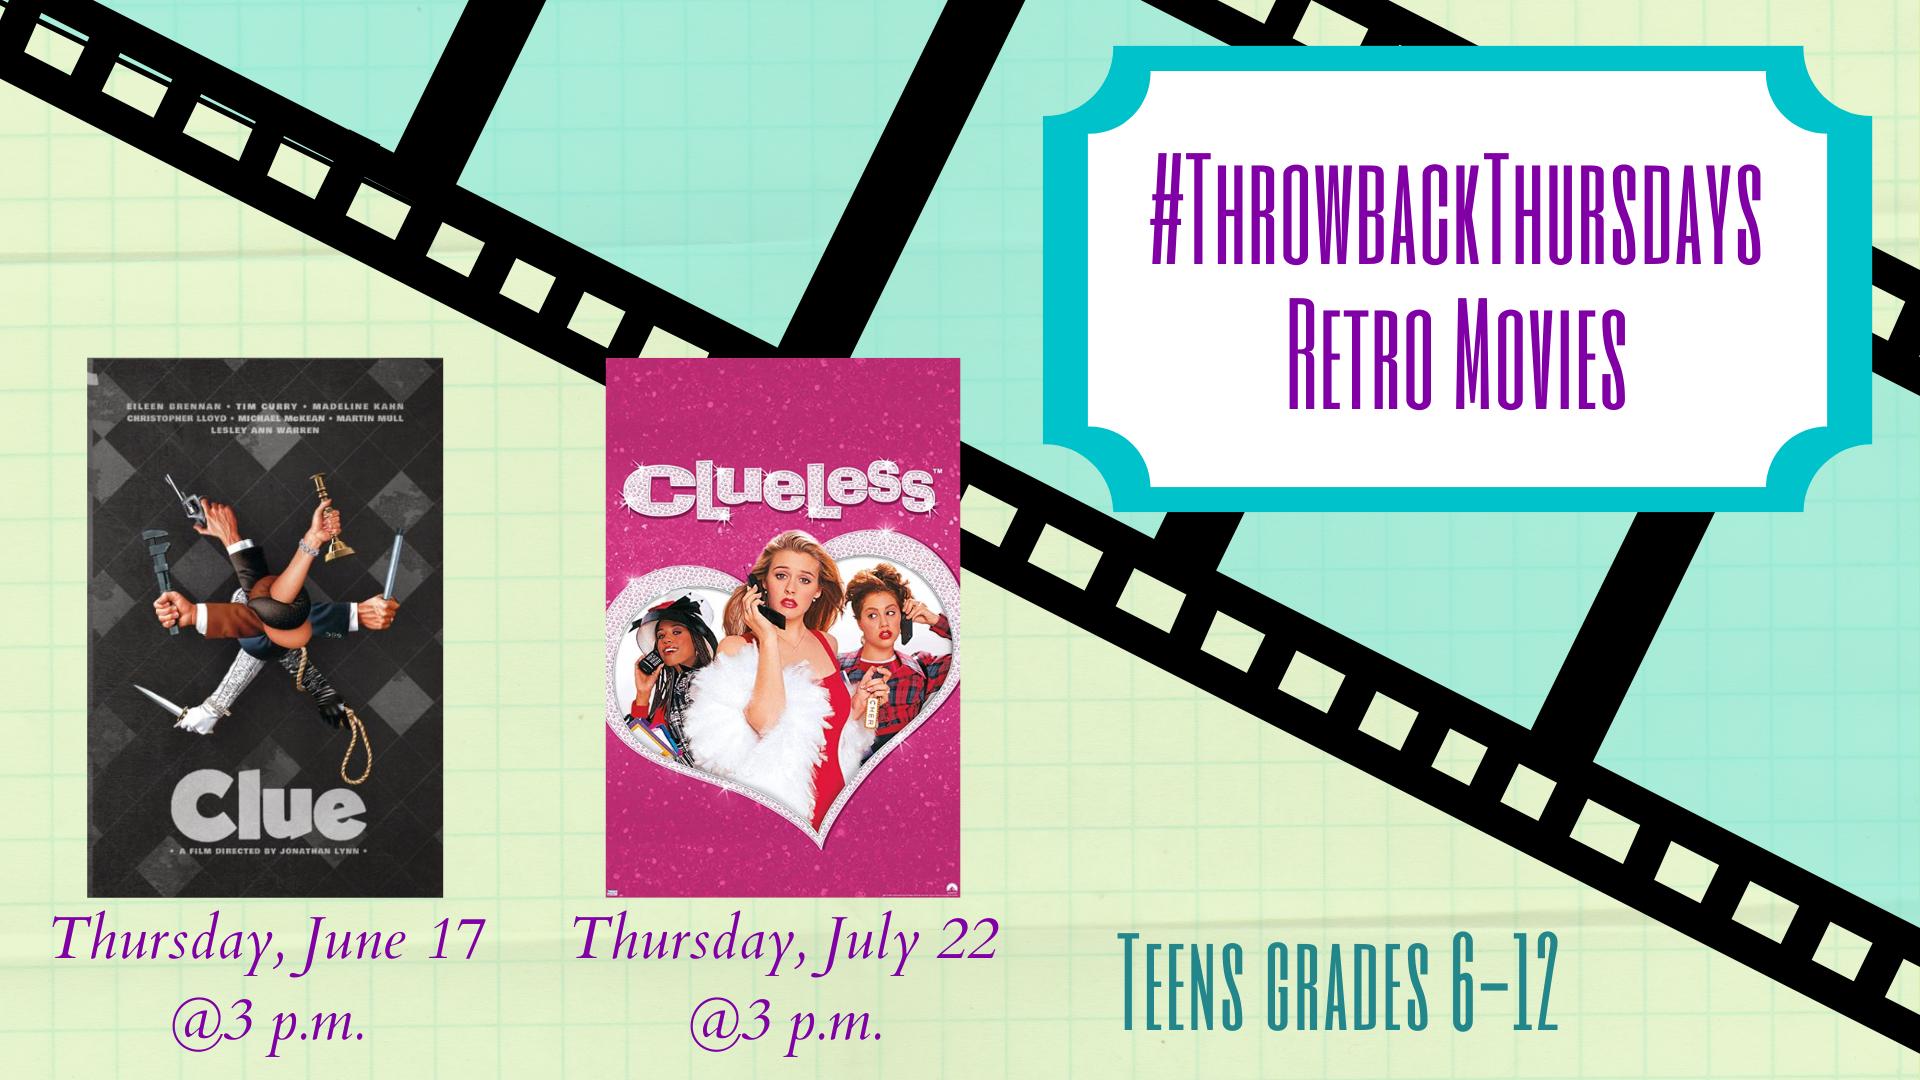 Throwback Thursday Movie: Clueless